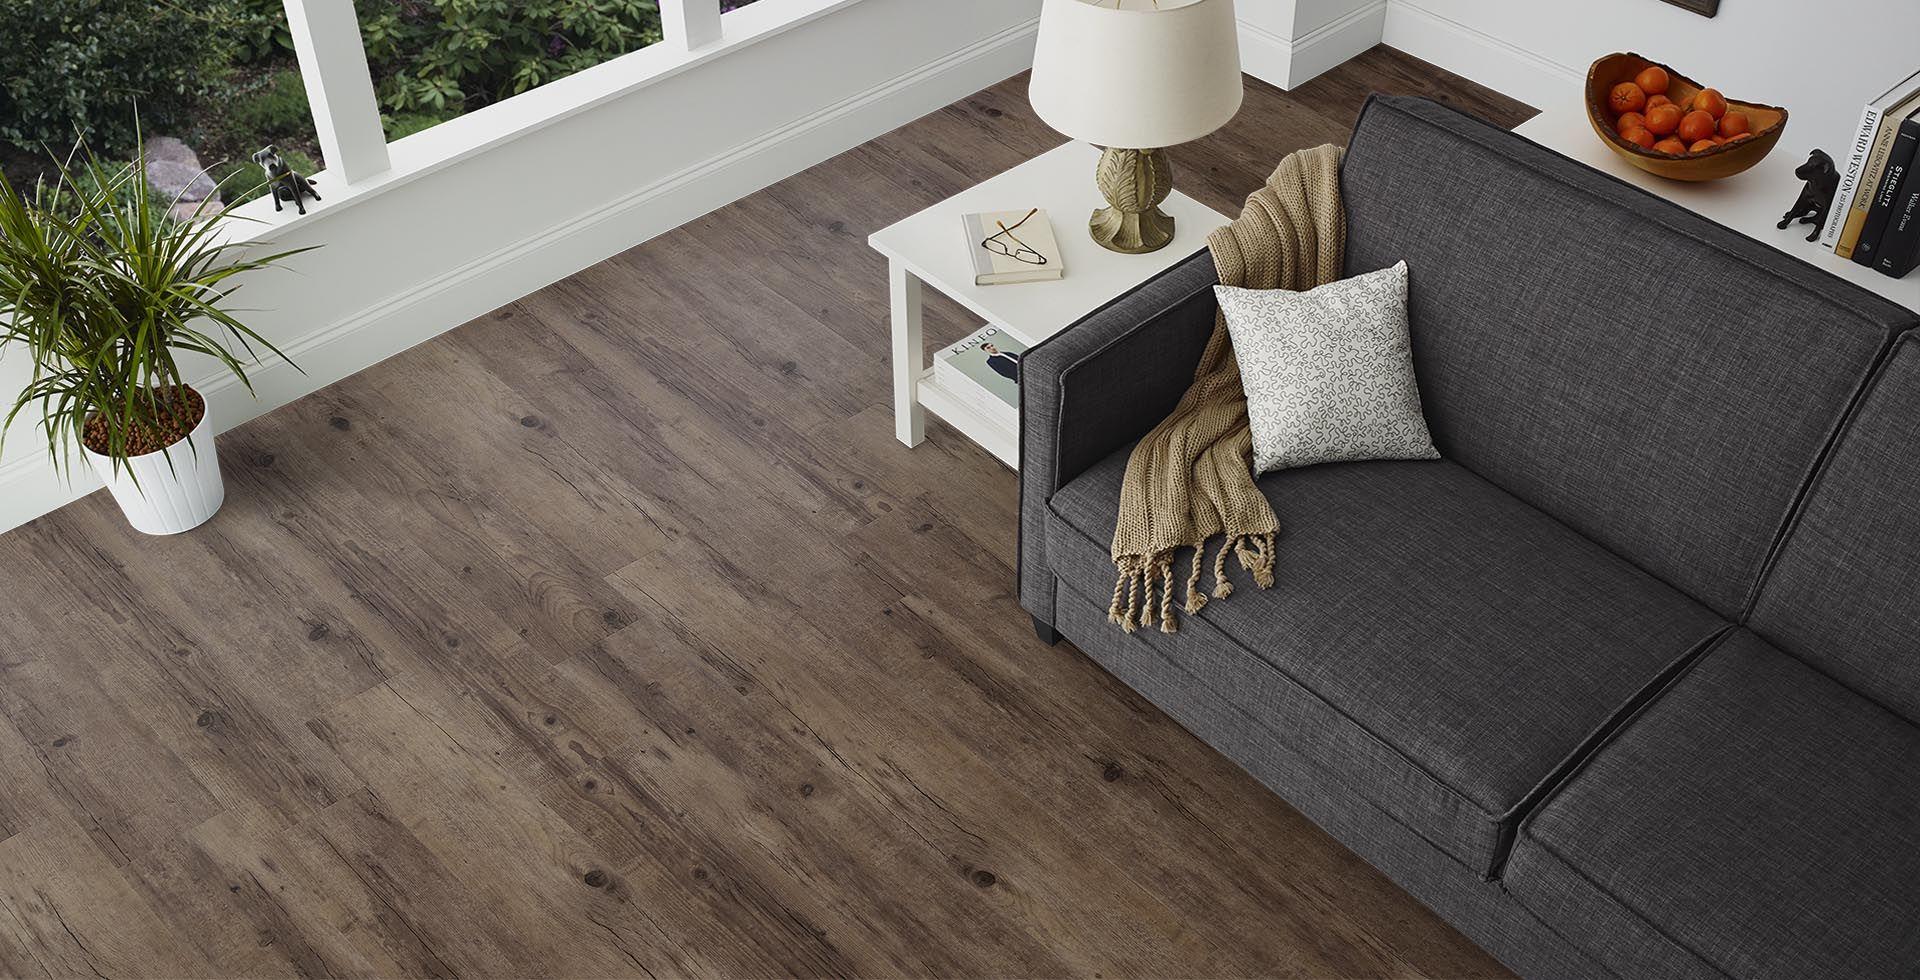 Alpaca Rigidcore Cliq Vinyl Plank Flooring Vinyl Flooring